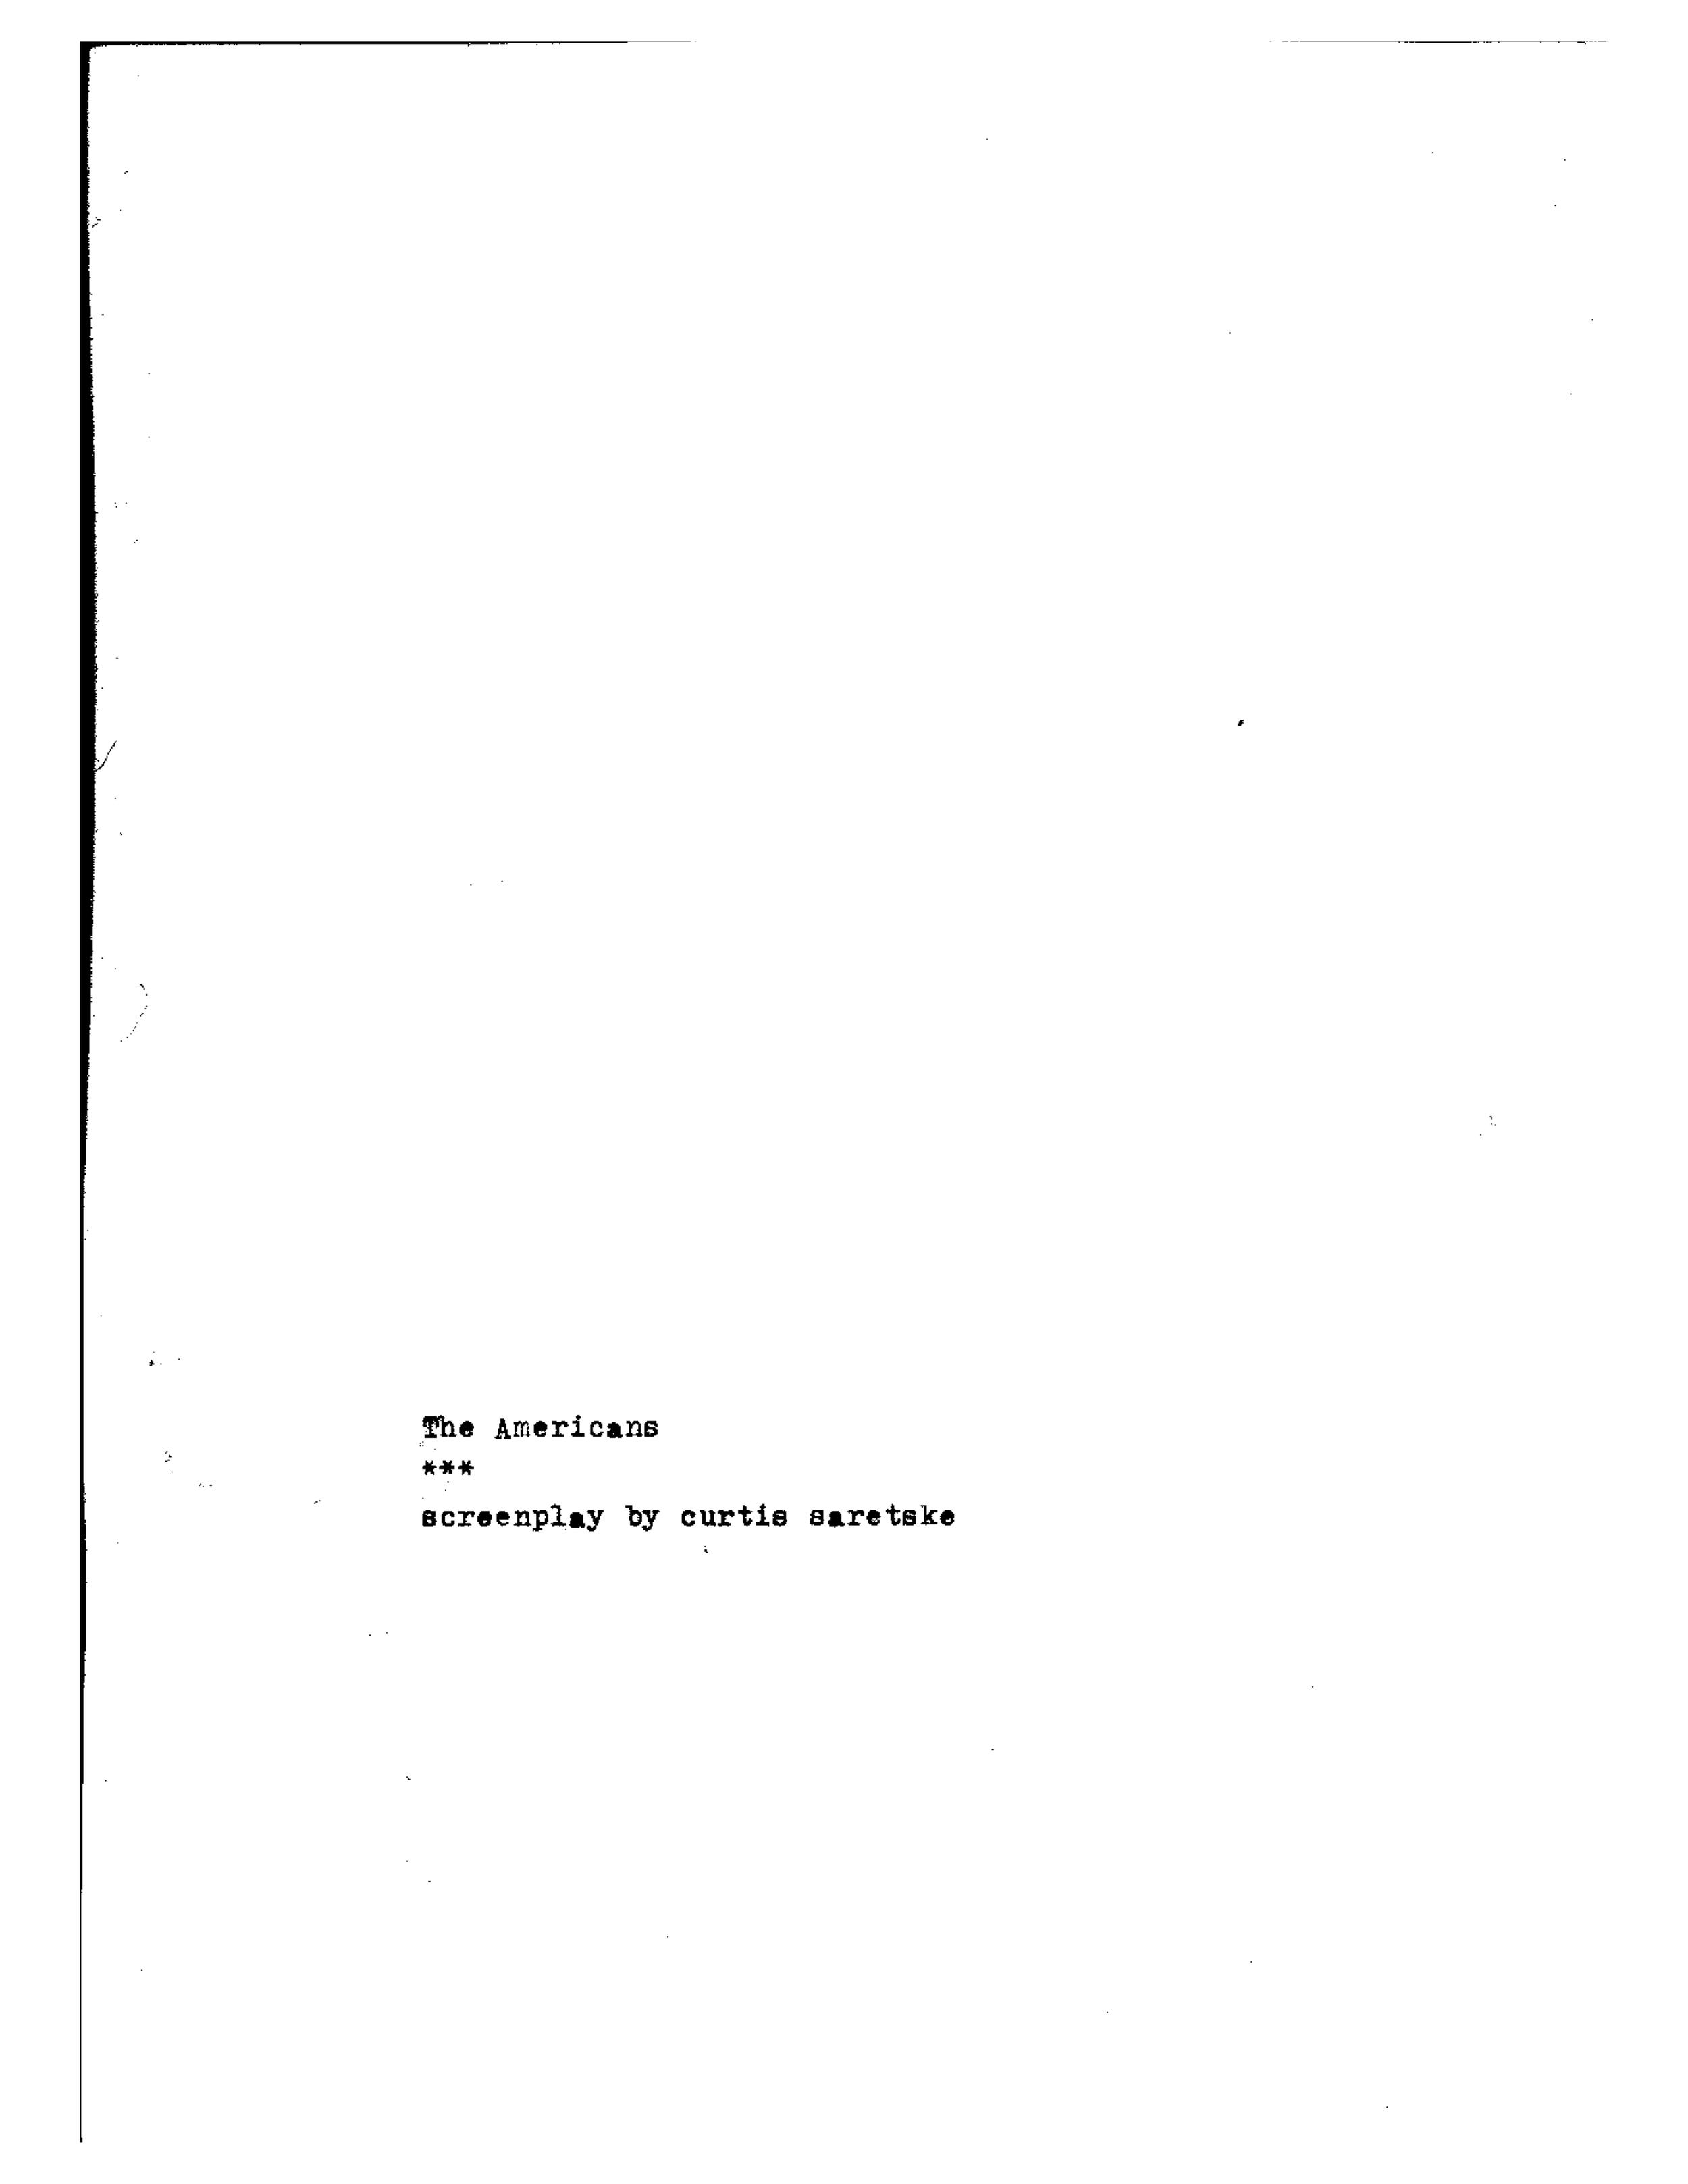 the_americans_typewriter.jpg